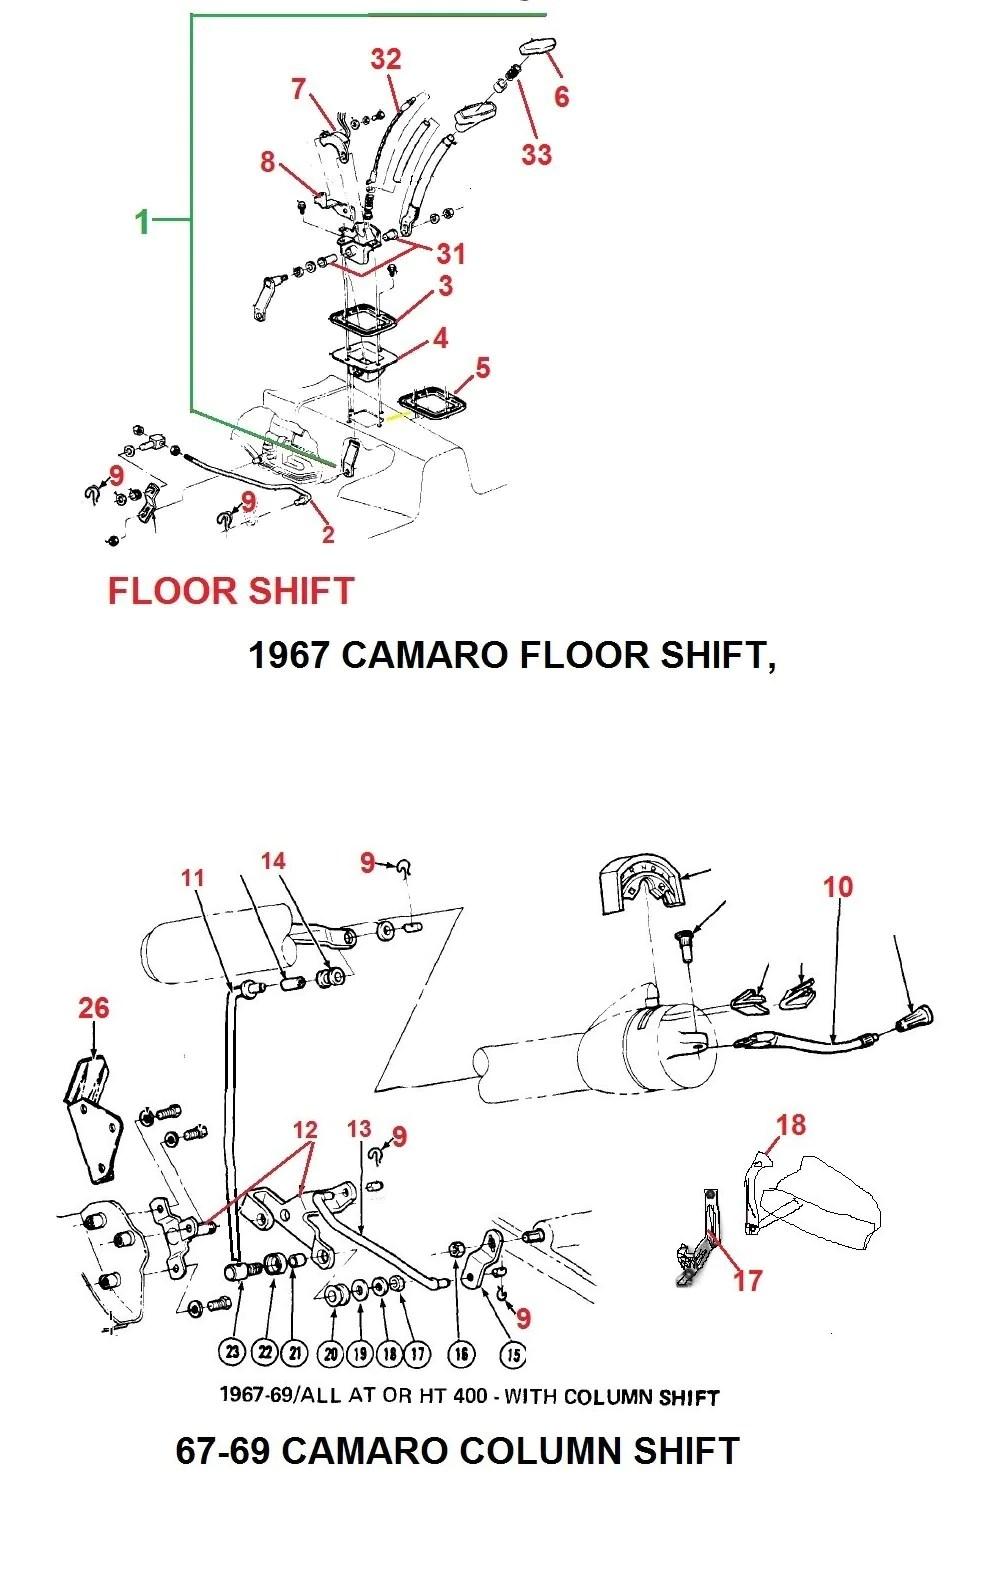 medium resolution of 1967 camaro auto floor shifter 67 69 camaro column shift parts